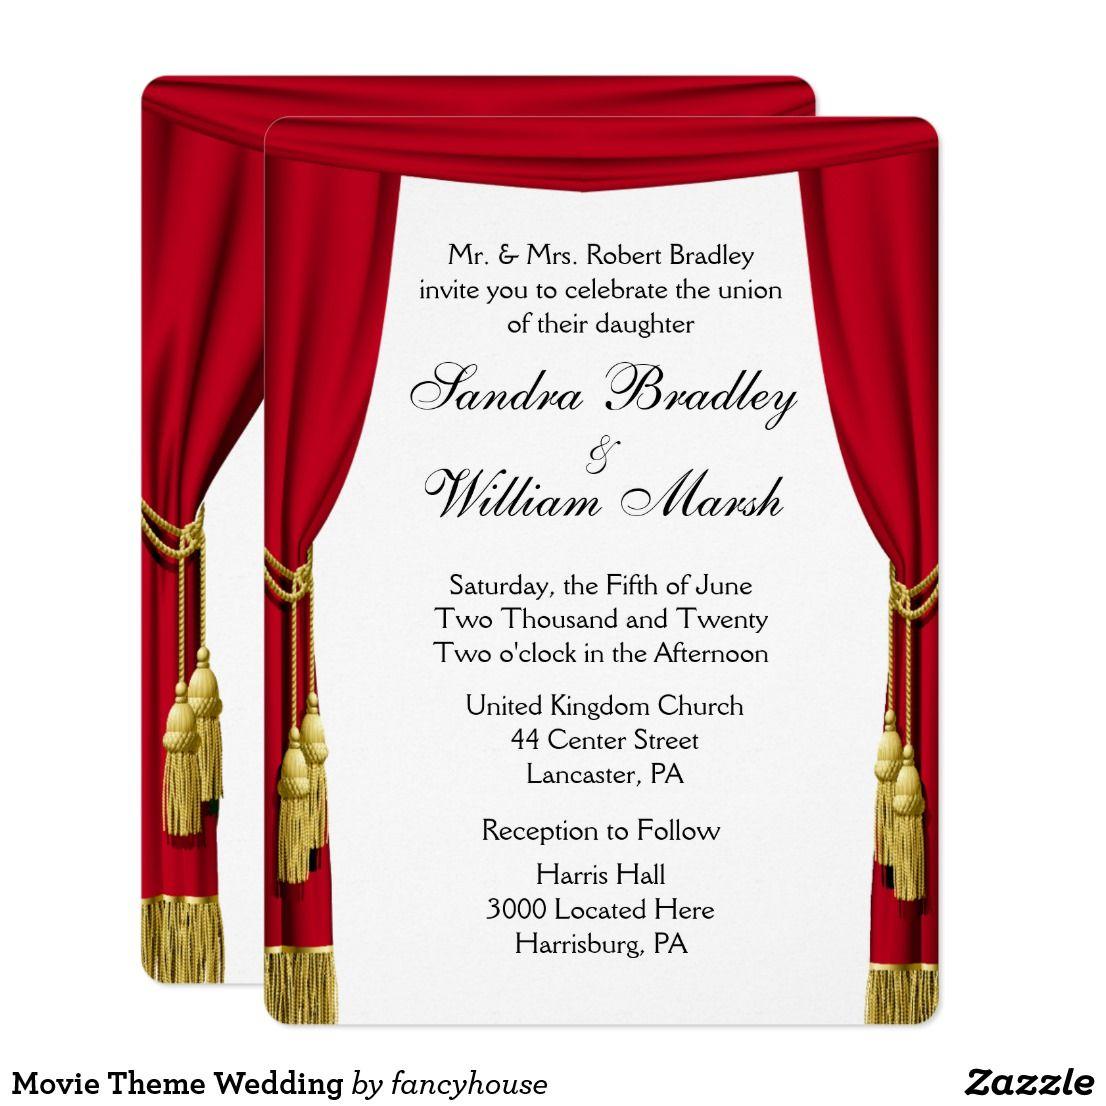 Movie / Theater Theme Wedding Invitation | Movie theme weddings ...